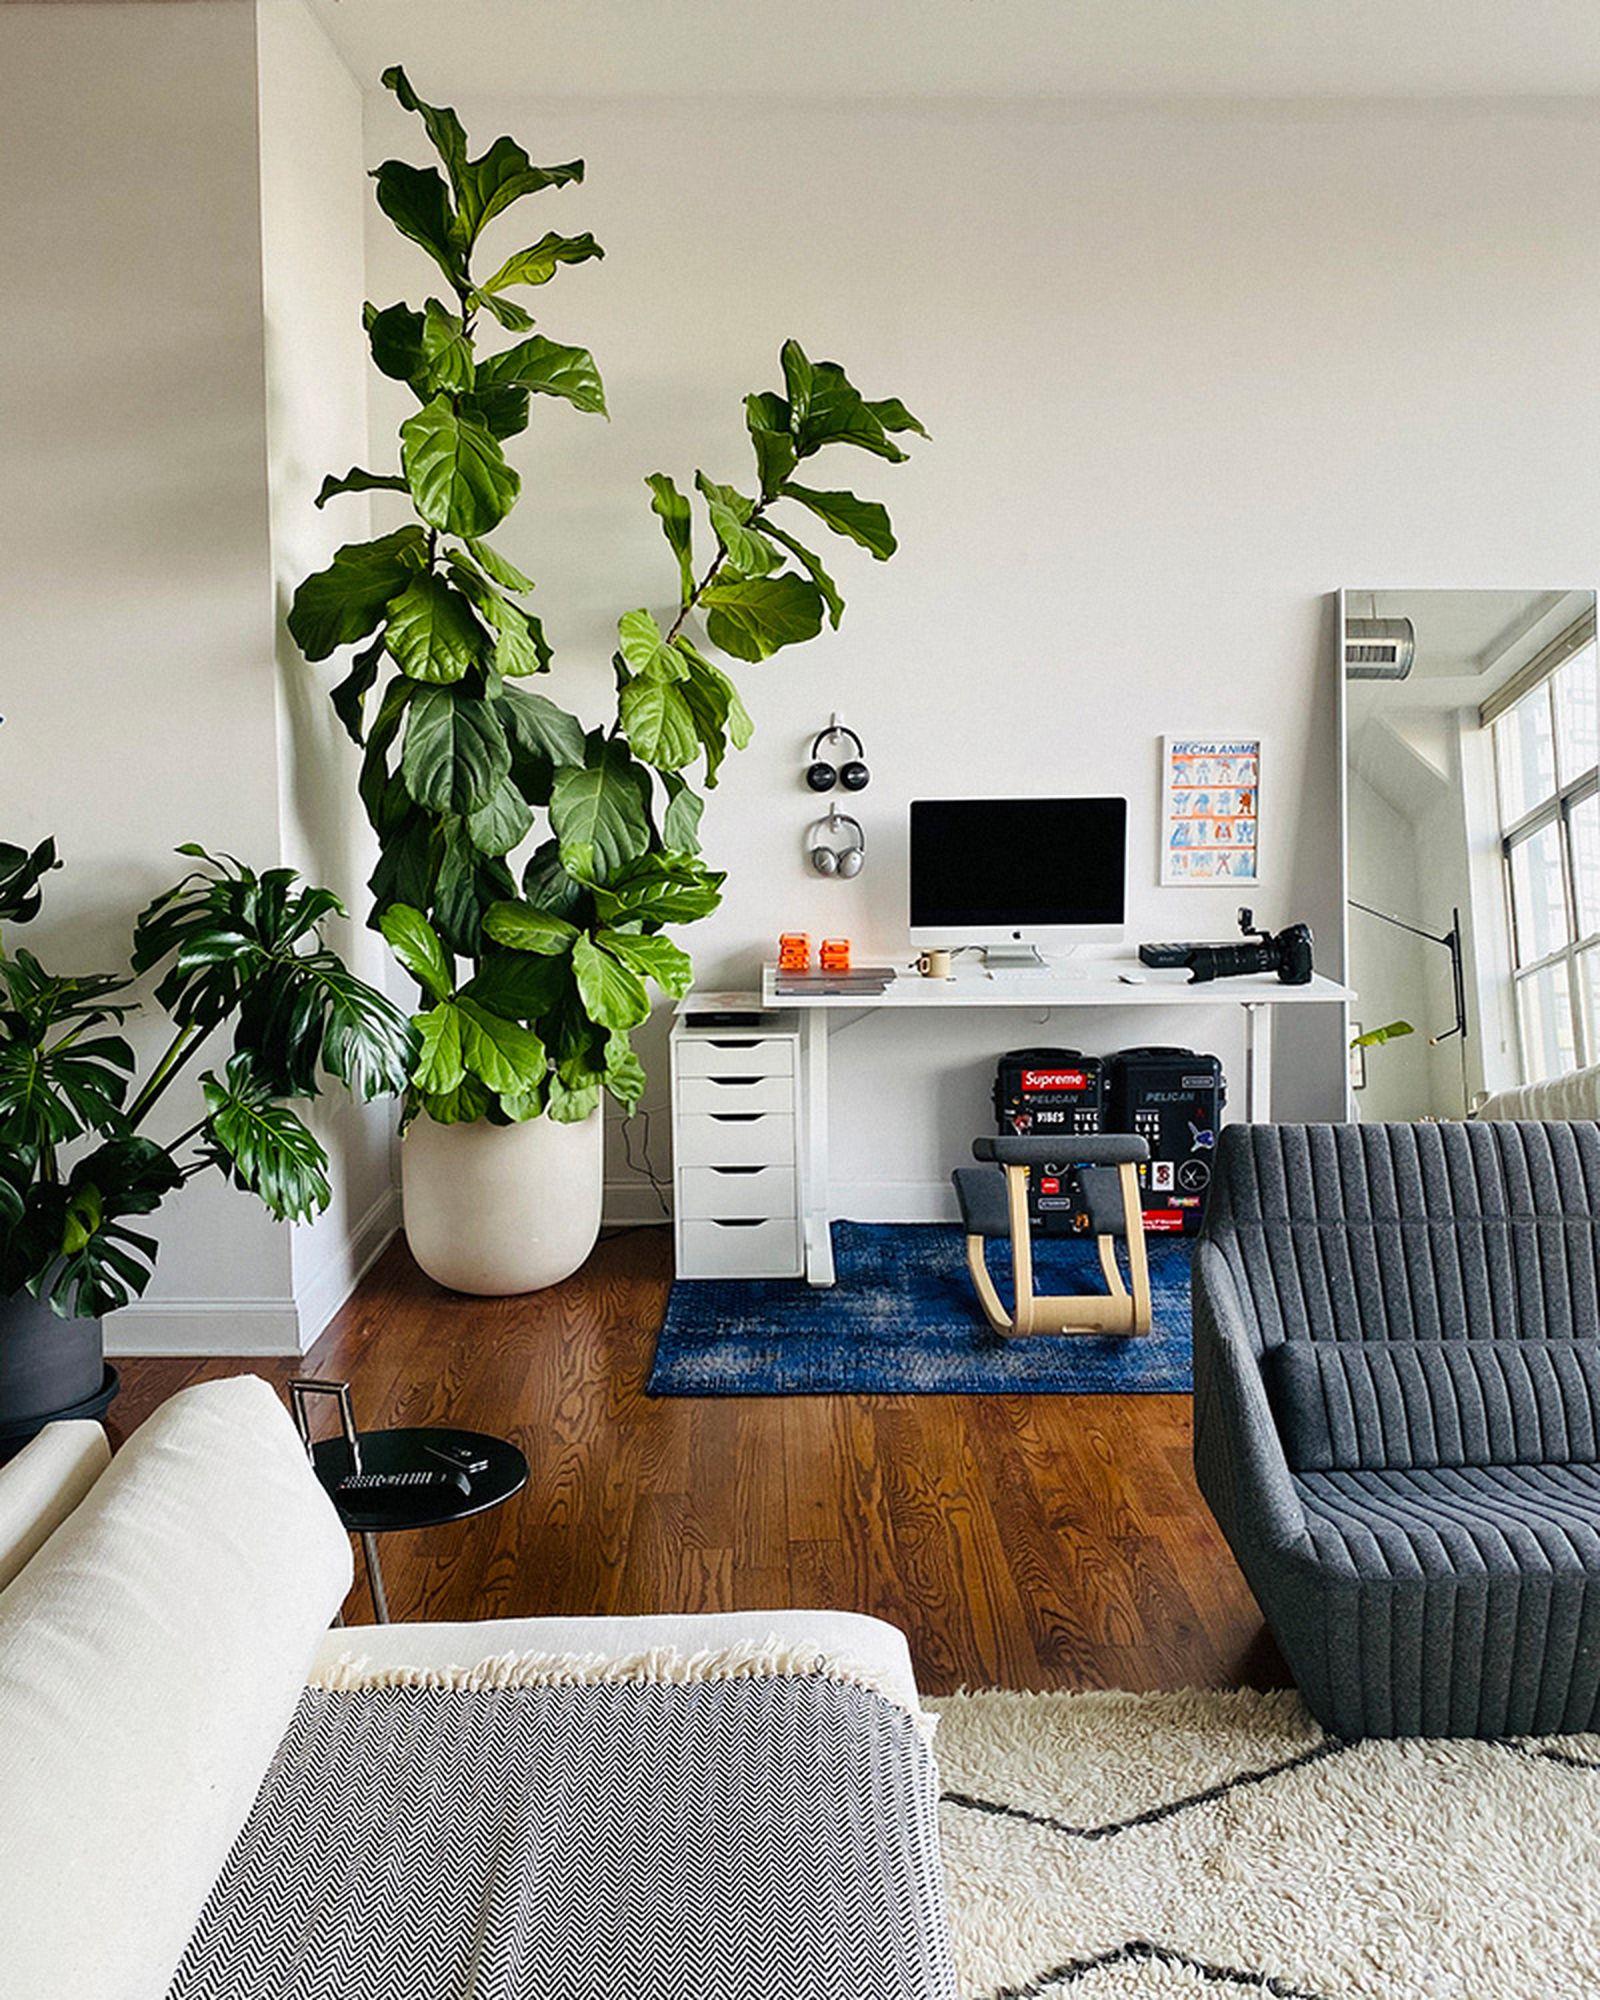 wfh-office-tour-look-inside-home-offices-tyler-joe-01